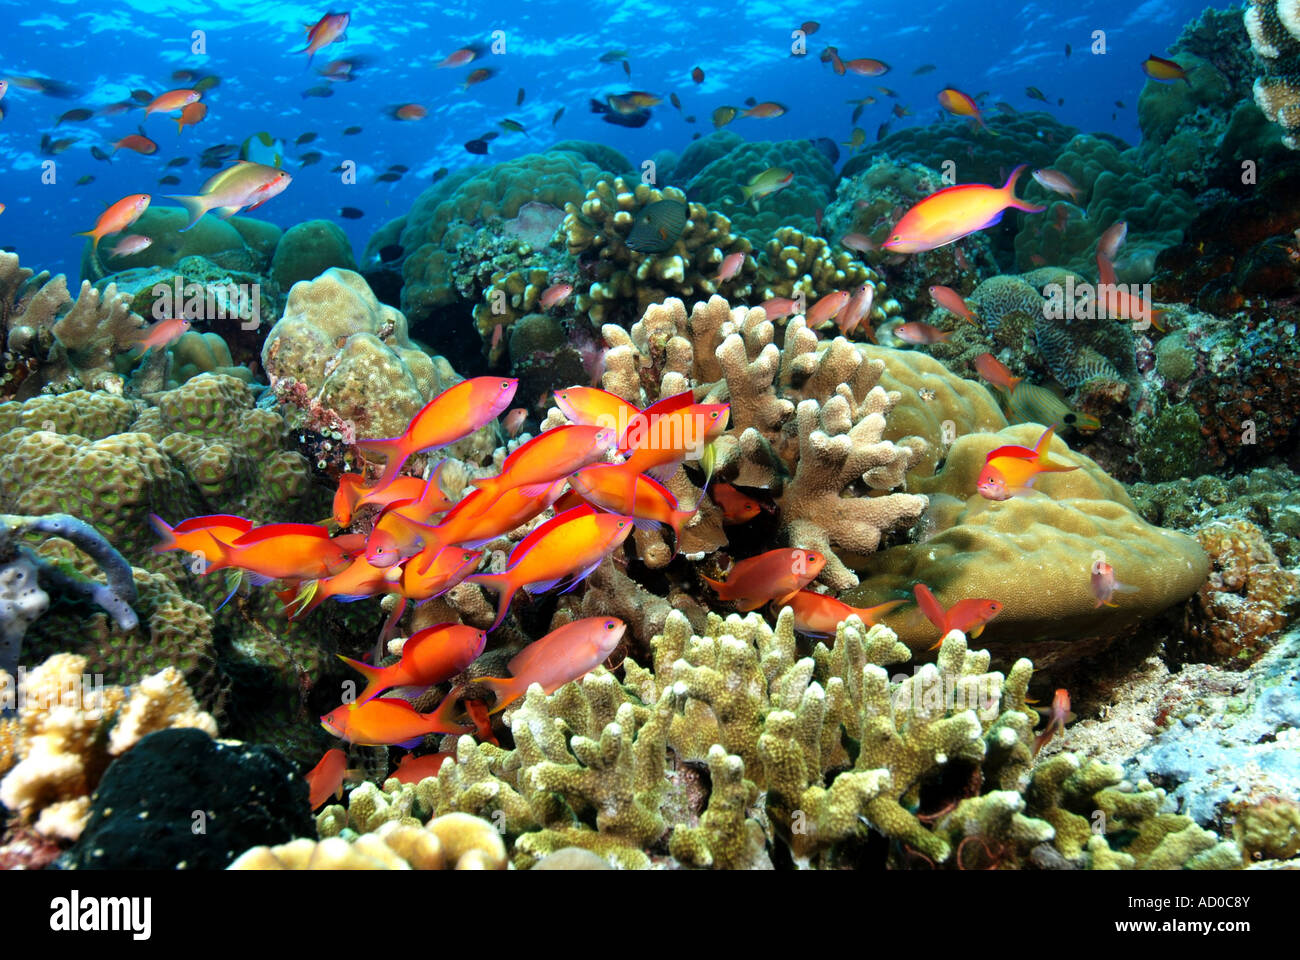 Tropical reef indonesia underwater scuba diving ocean for Reef tropical fish